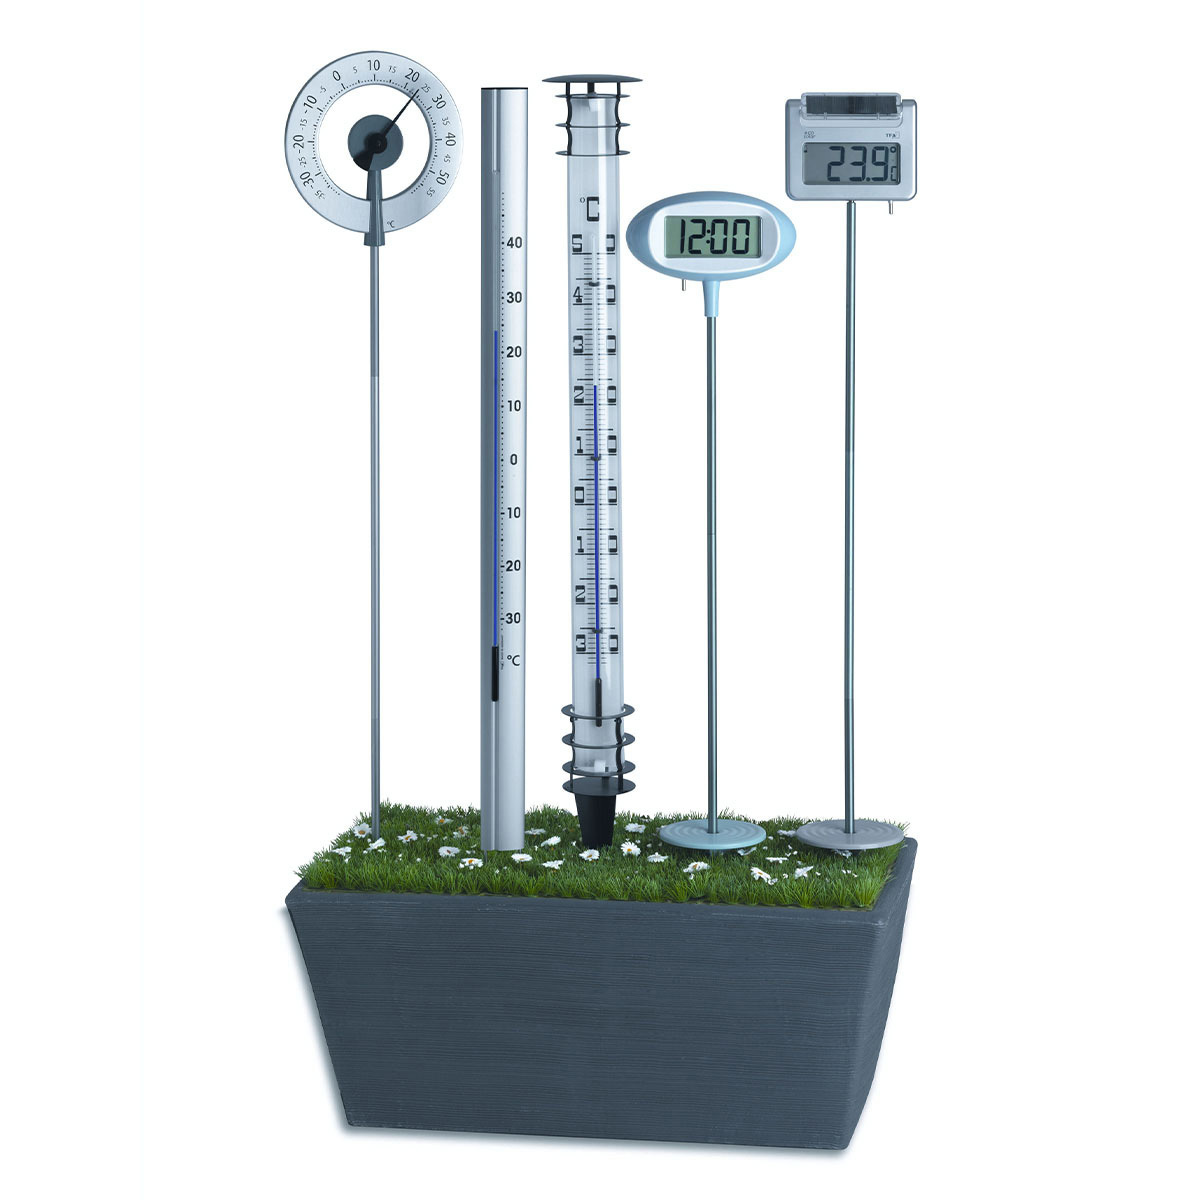 98-3039-tfa-display-gartenthermometer-anwendung-1200x1200px.jpg